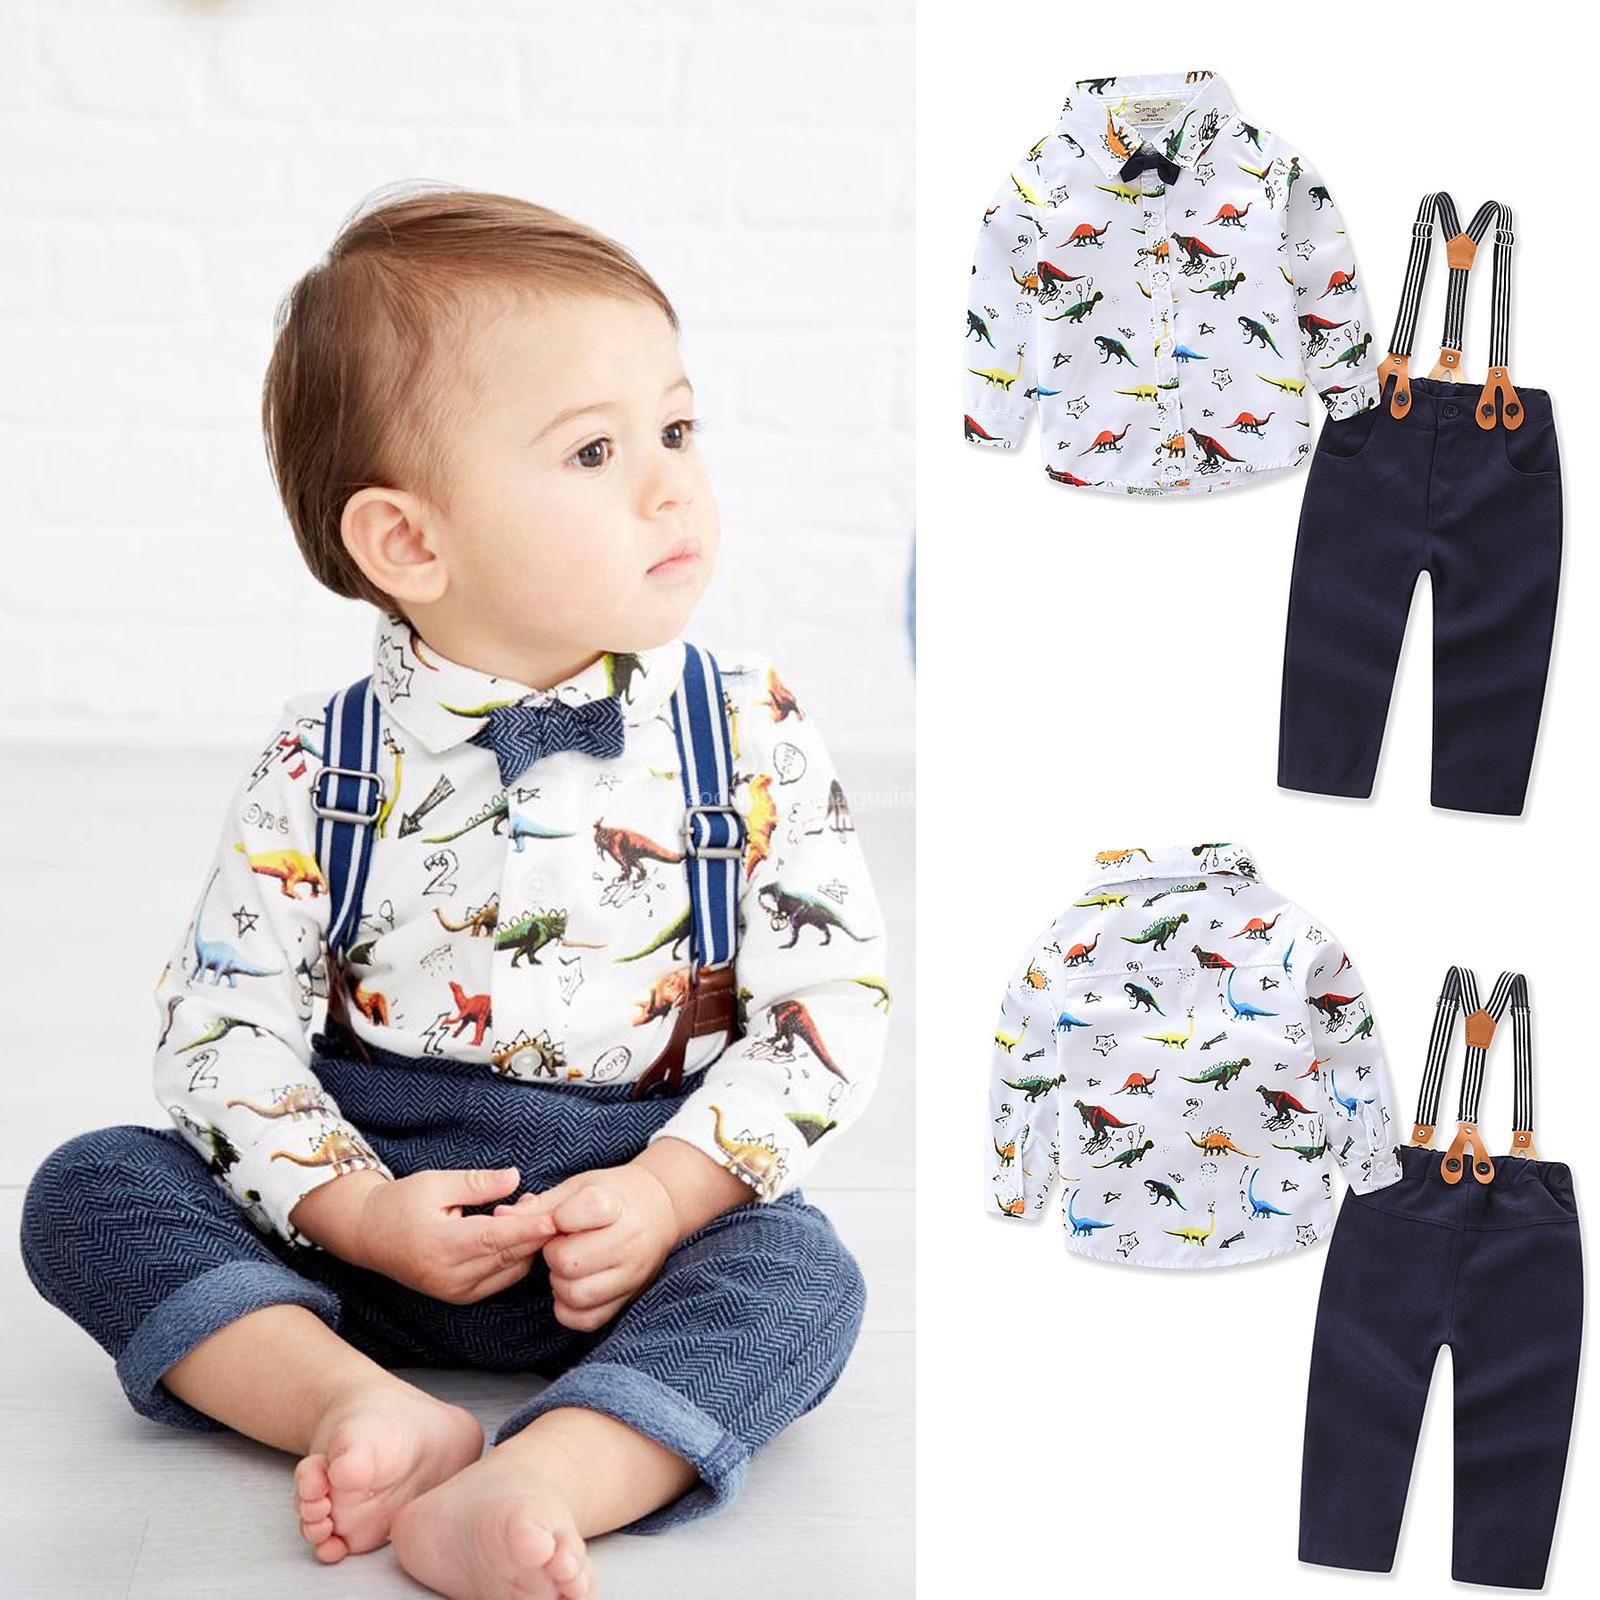 2Pcs Toddler Baby Boys Kids Gentleman Bow Shirt Tops Denim Pants Clothes Outfits